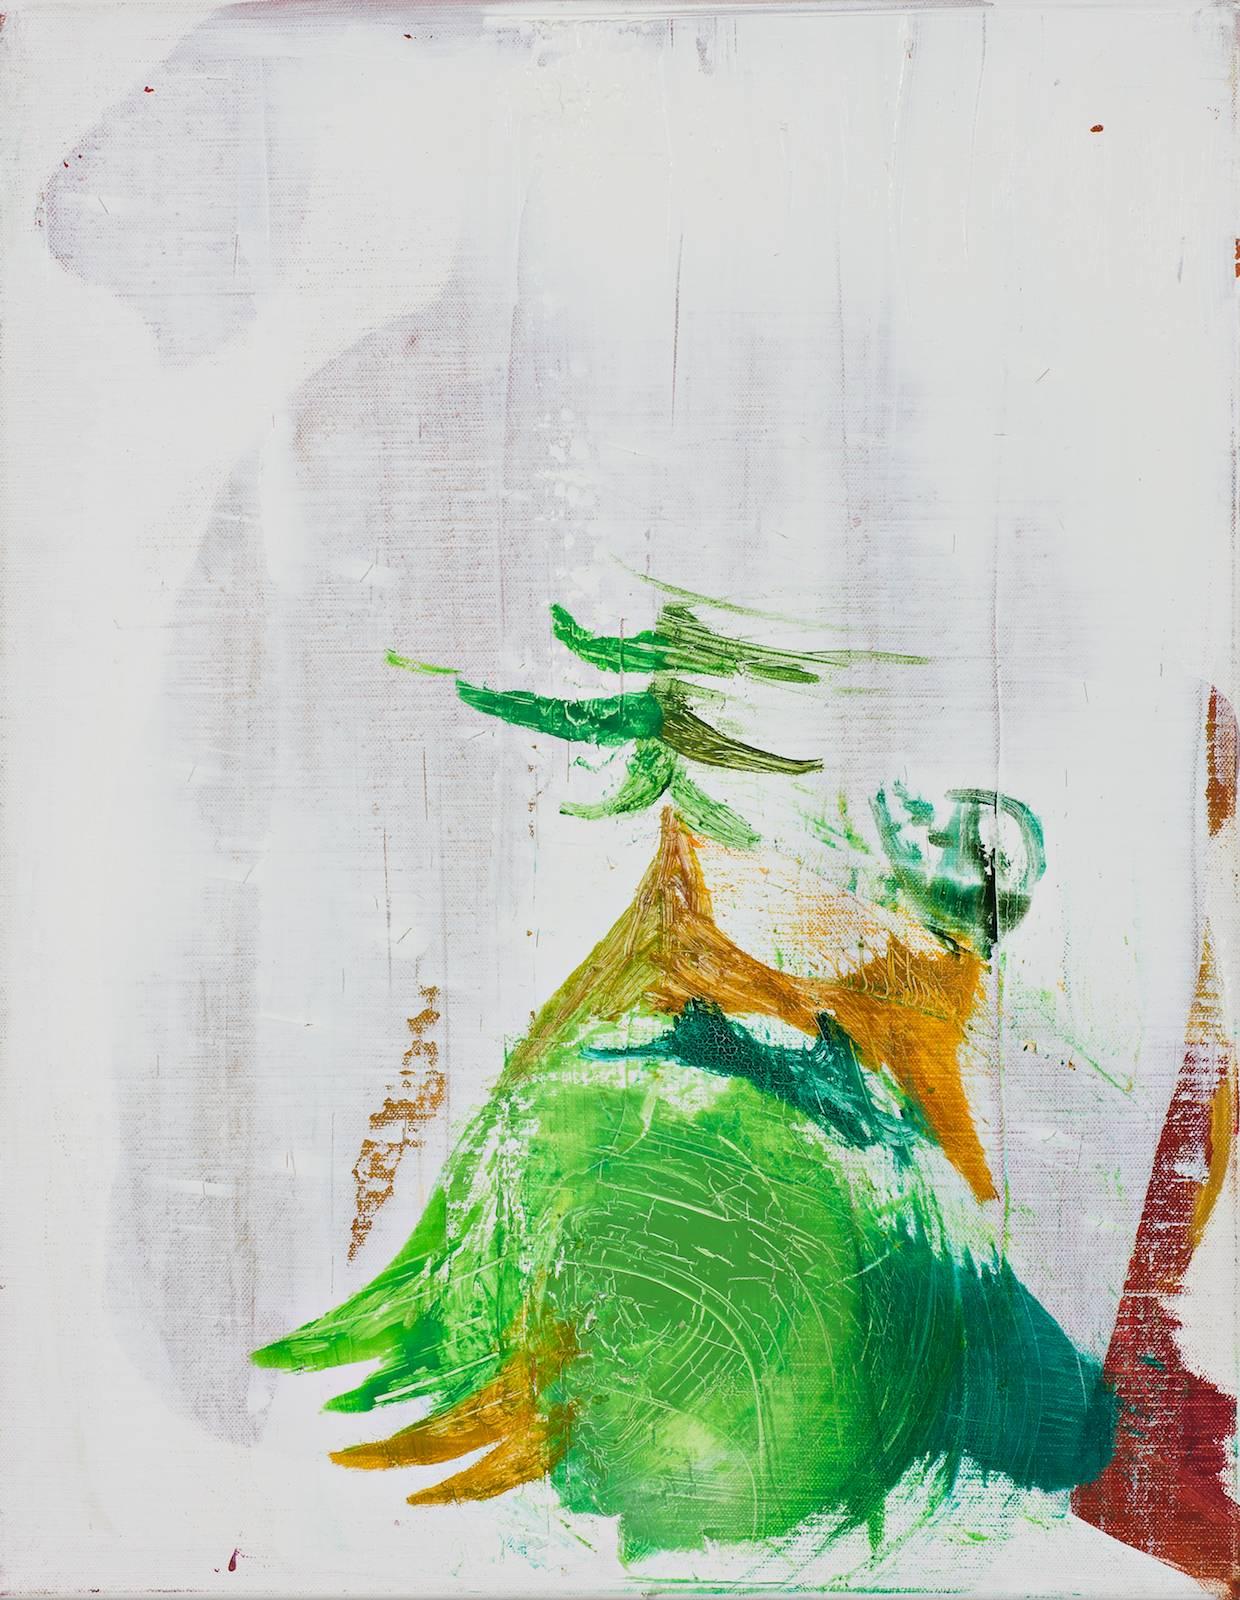 Memorandum / Grenadine Paintings, 2010, oil on canvas, 52 x 42 cm